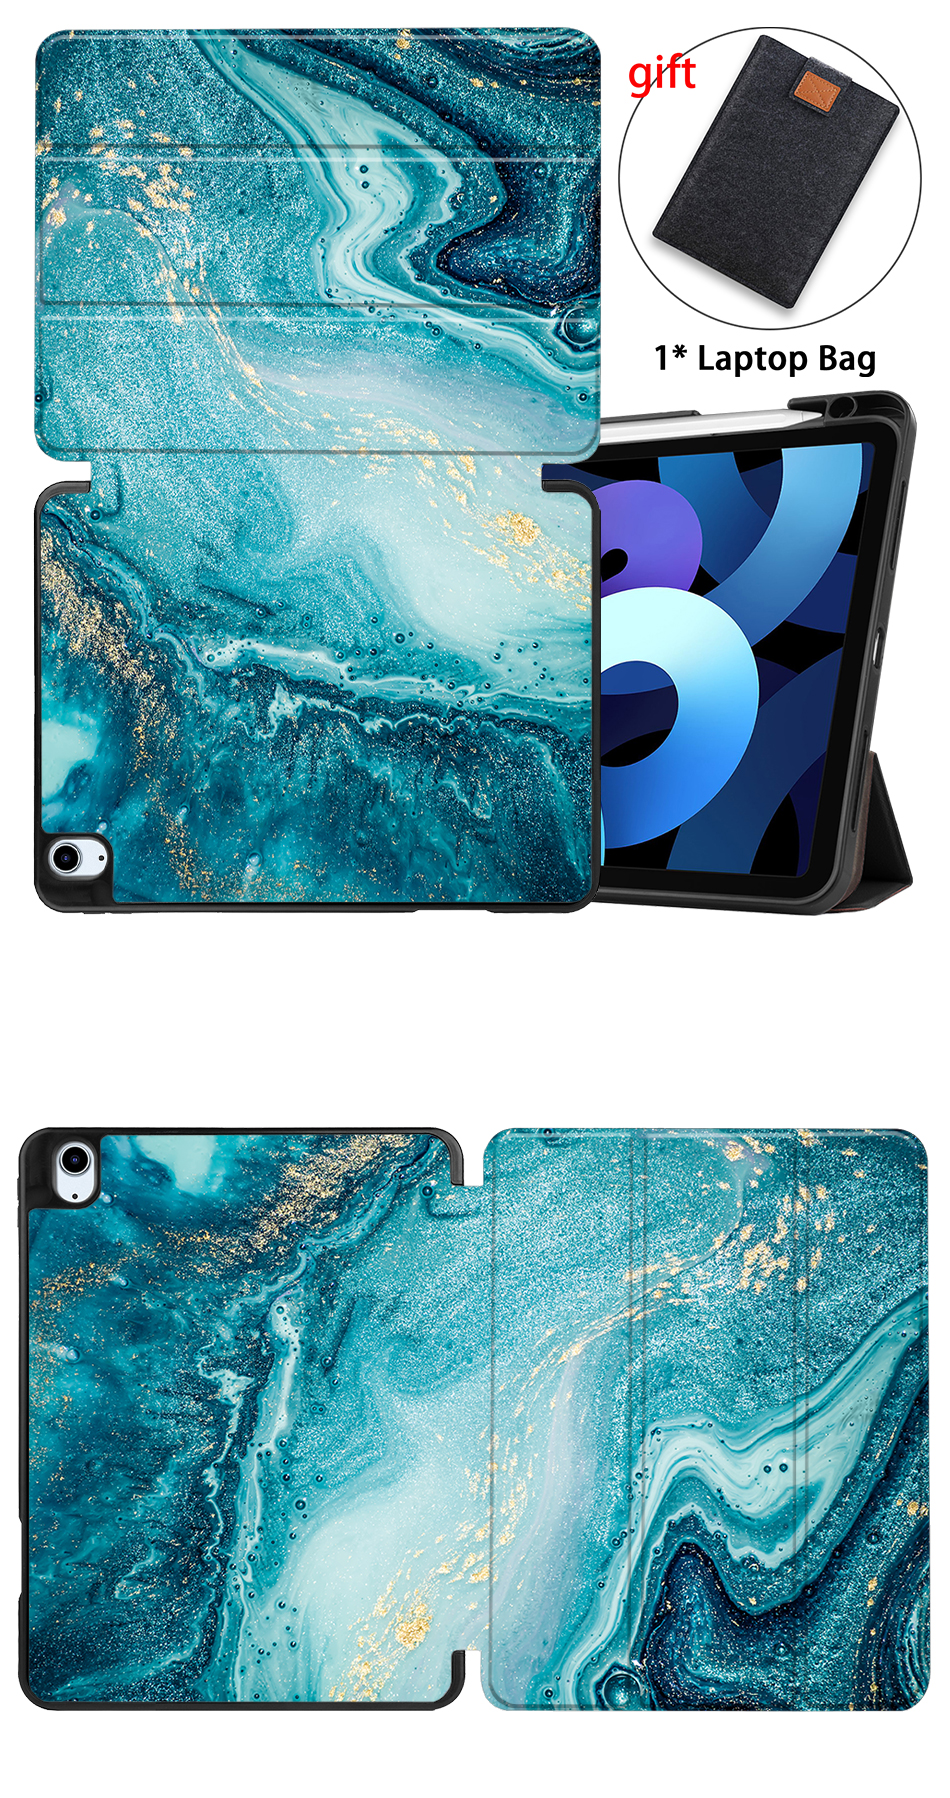 Air MTT Generation Leather inch Stand 4th Soft Case TPU+PU 2020 funda iPad For Flip 10.9